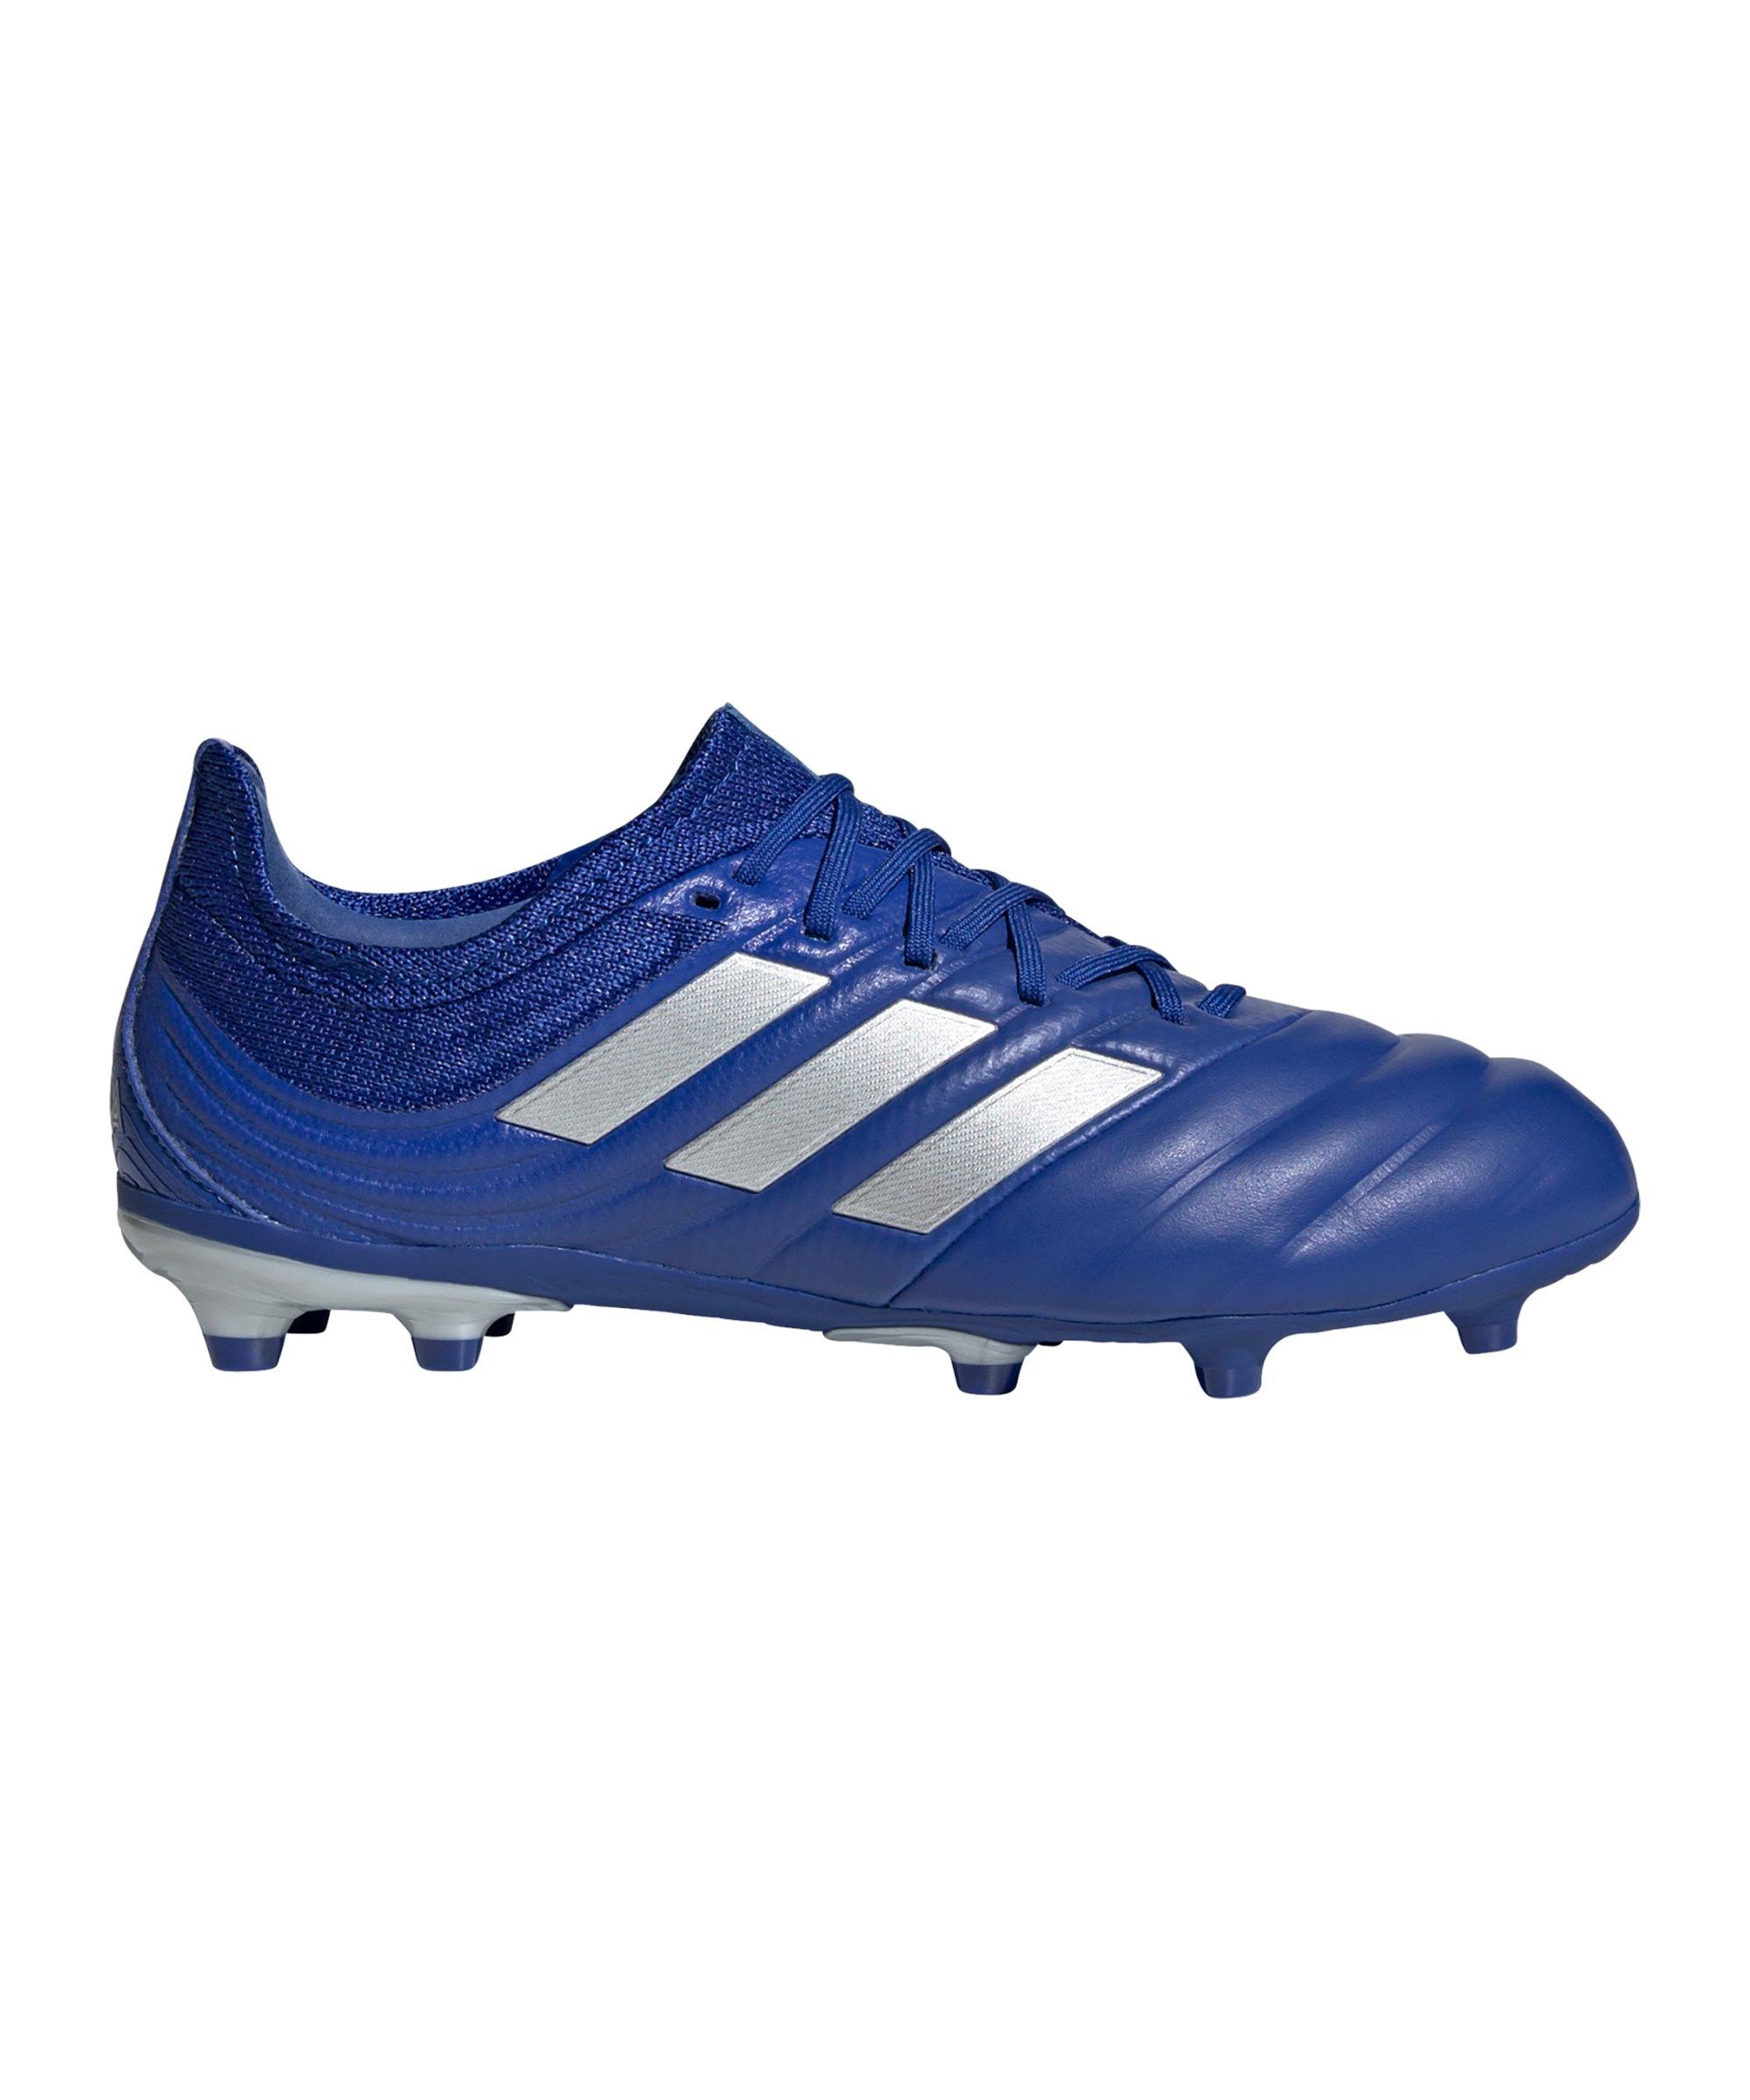 adidas COPA Inflight 20.1 FG J Kids Blau Silber - blau